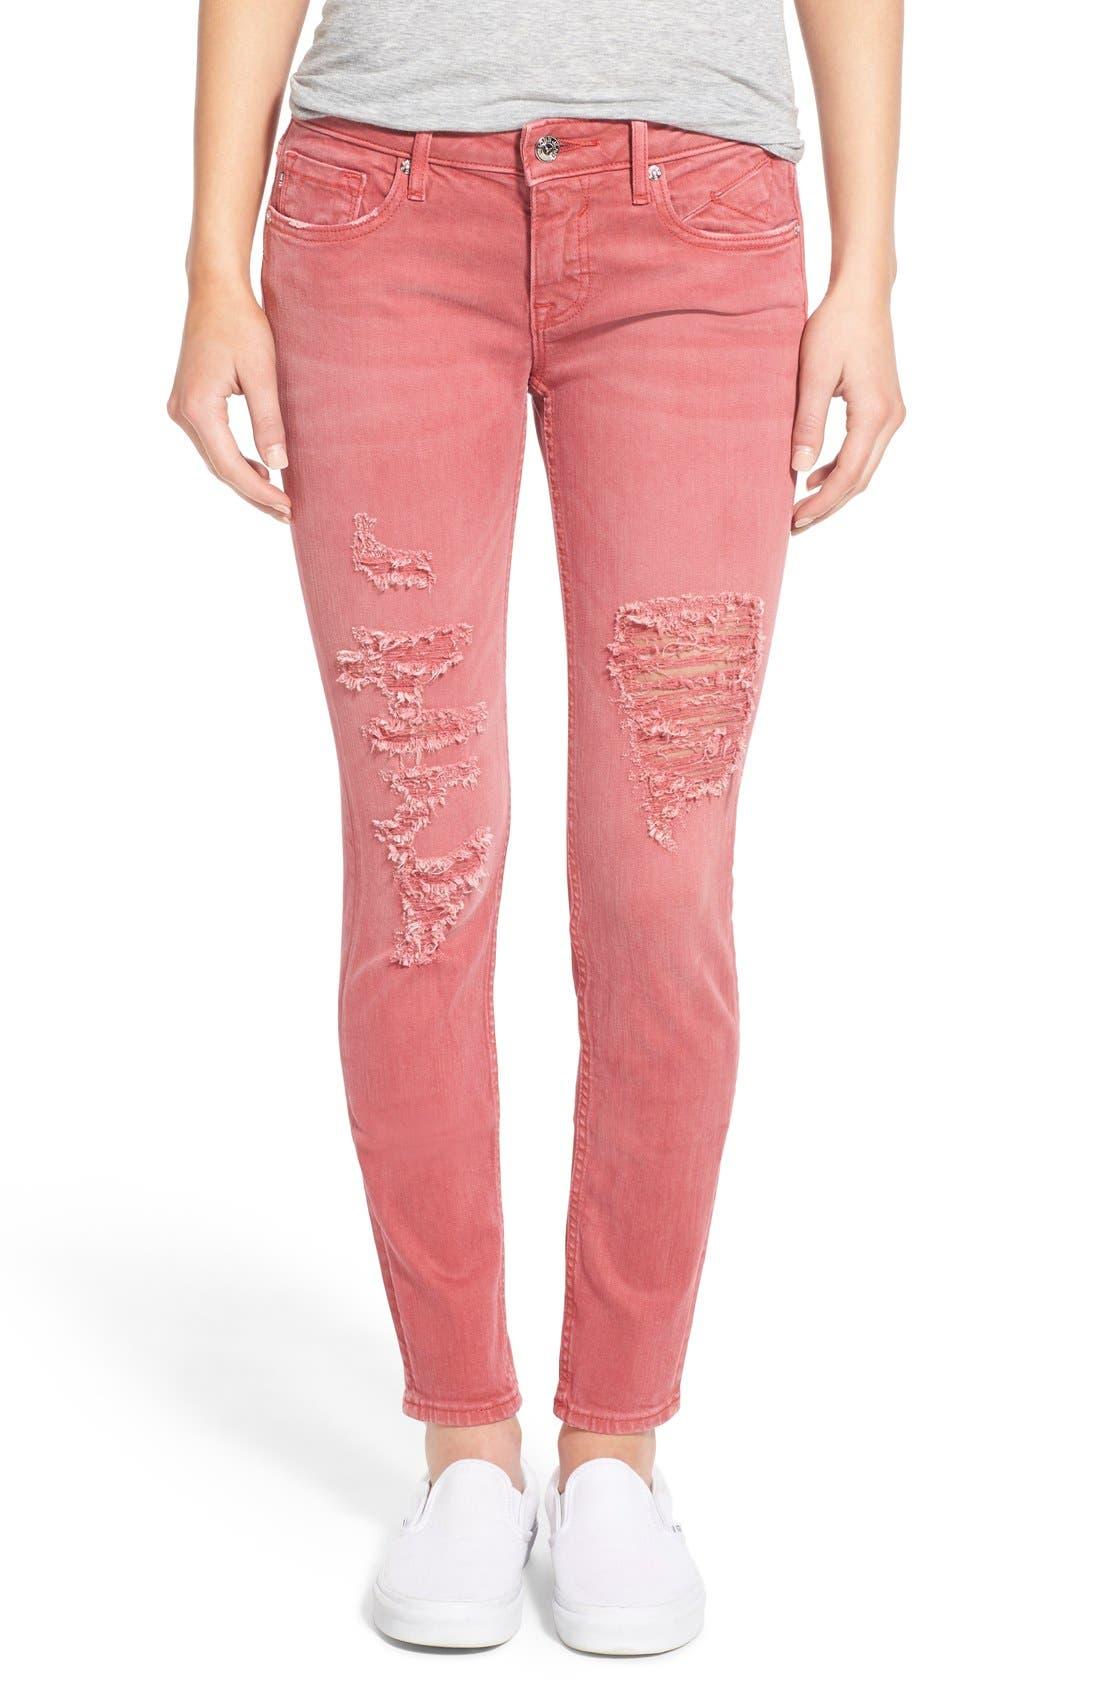 Alternate Image 1 Selected - Vigoss 'Chelsea' Distressed Skinny Jeans